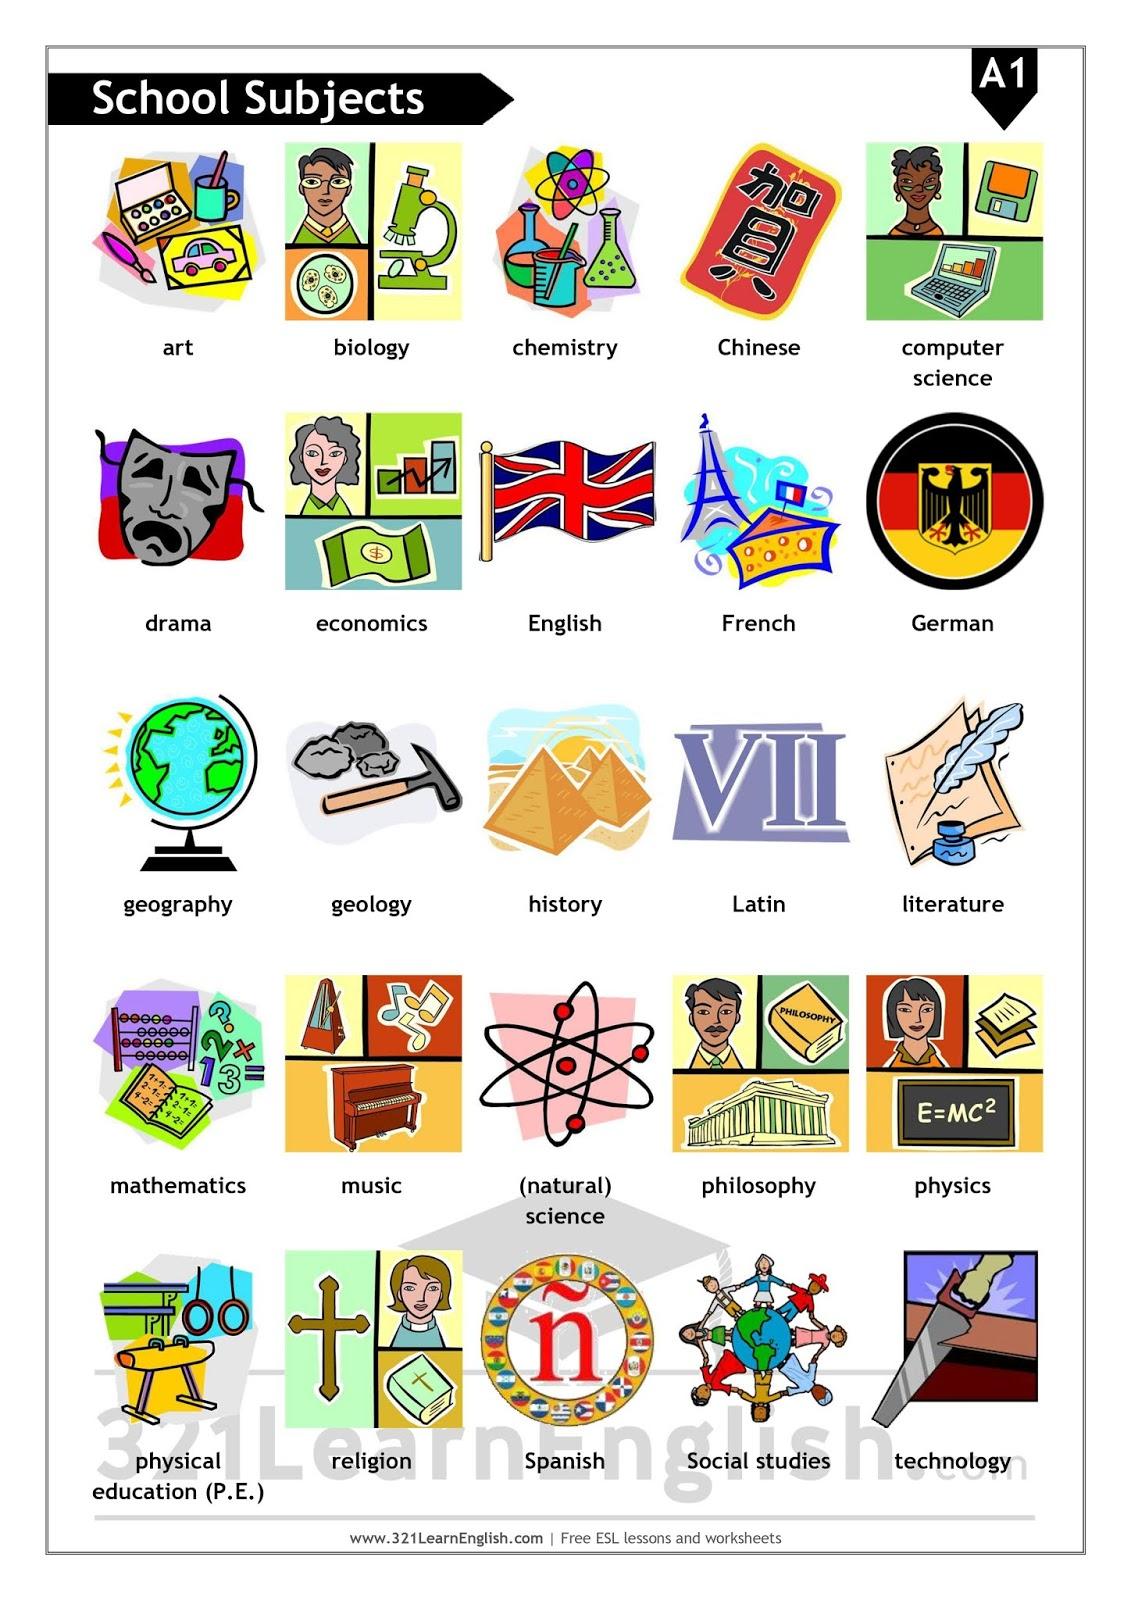 321 Learn English Esl Vocabulary School Subjects